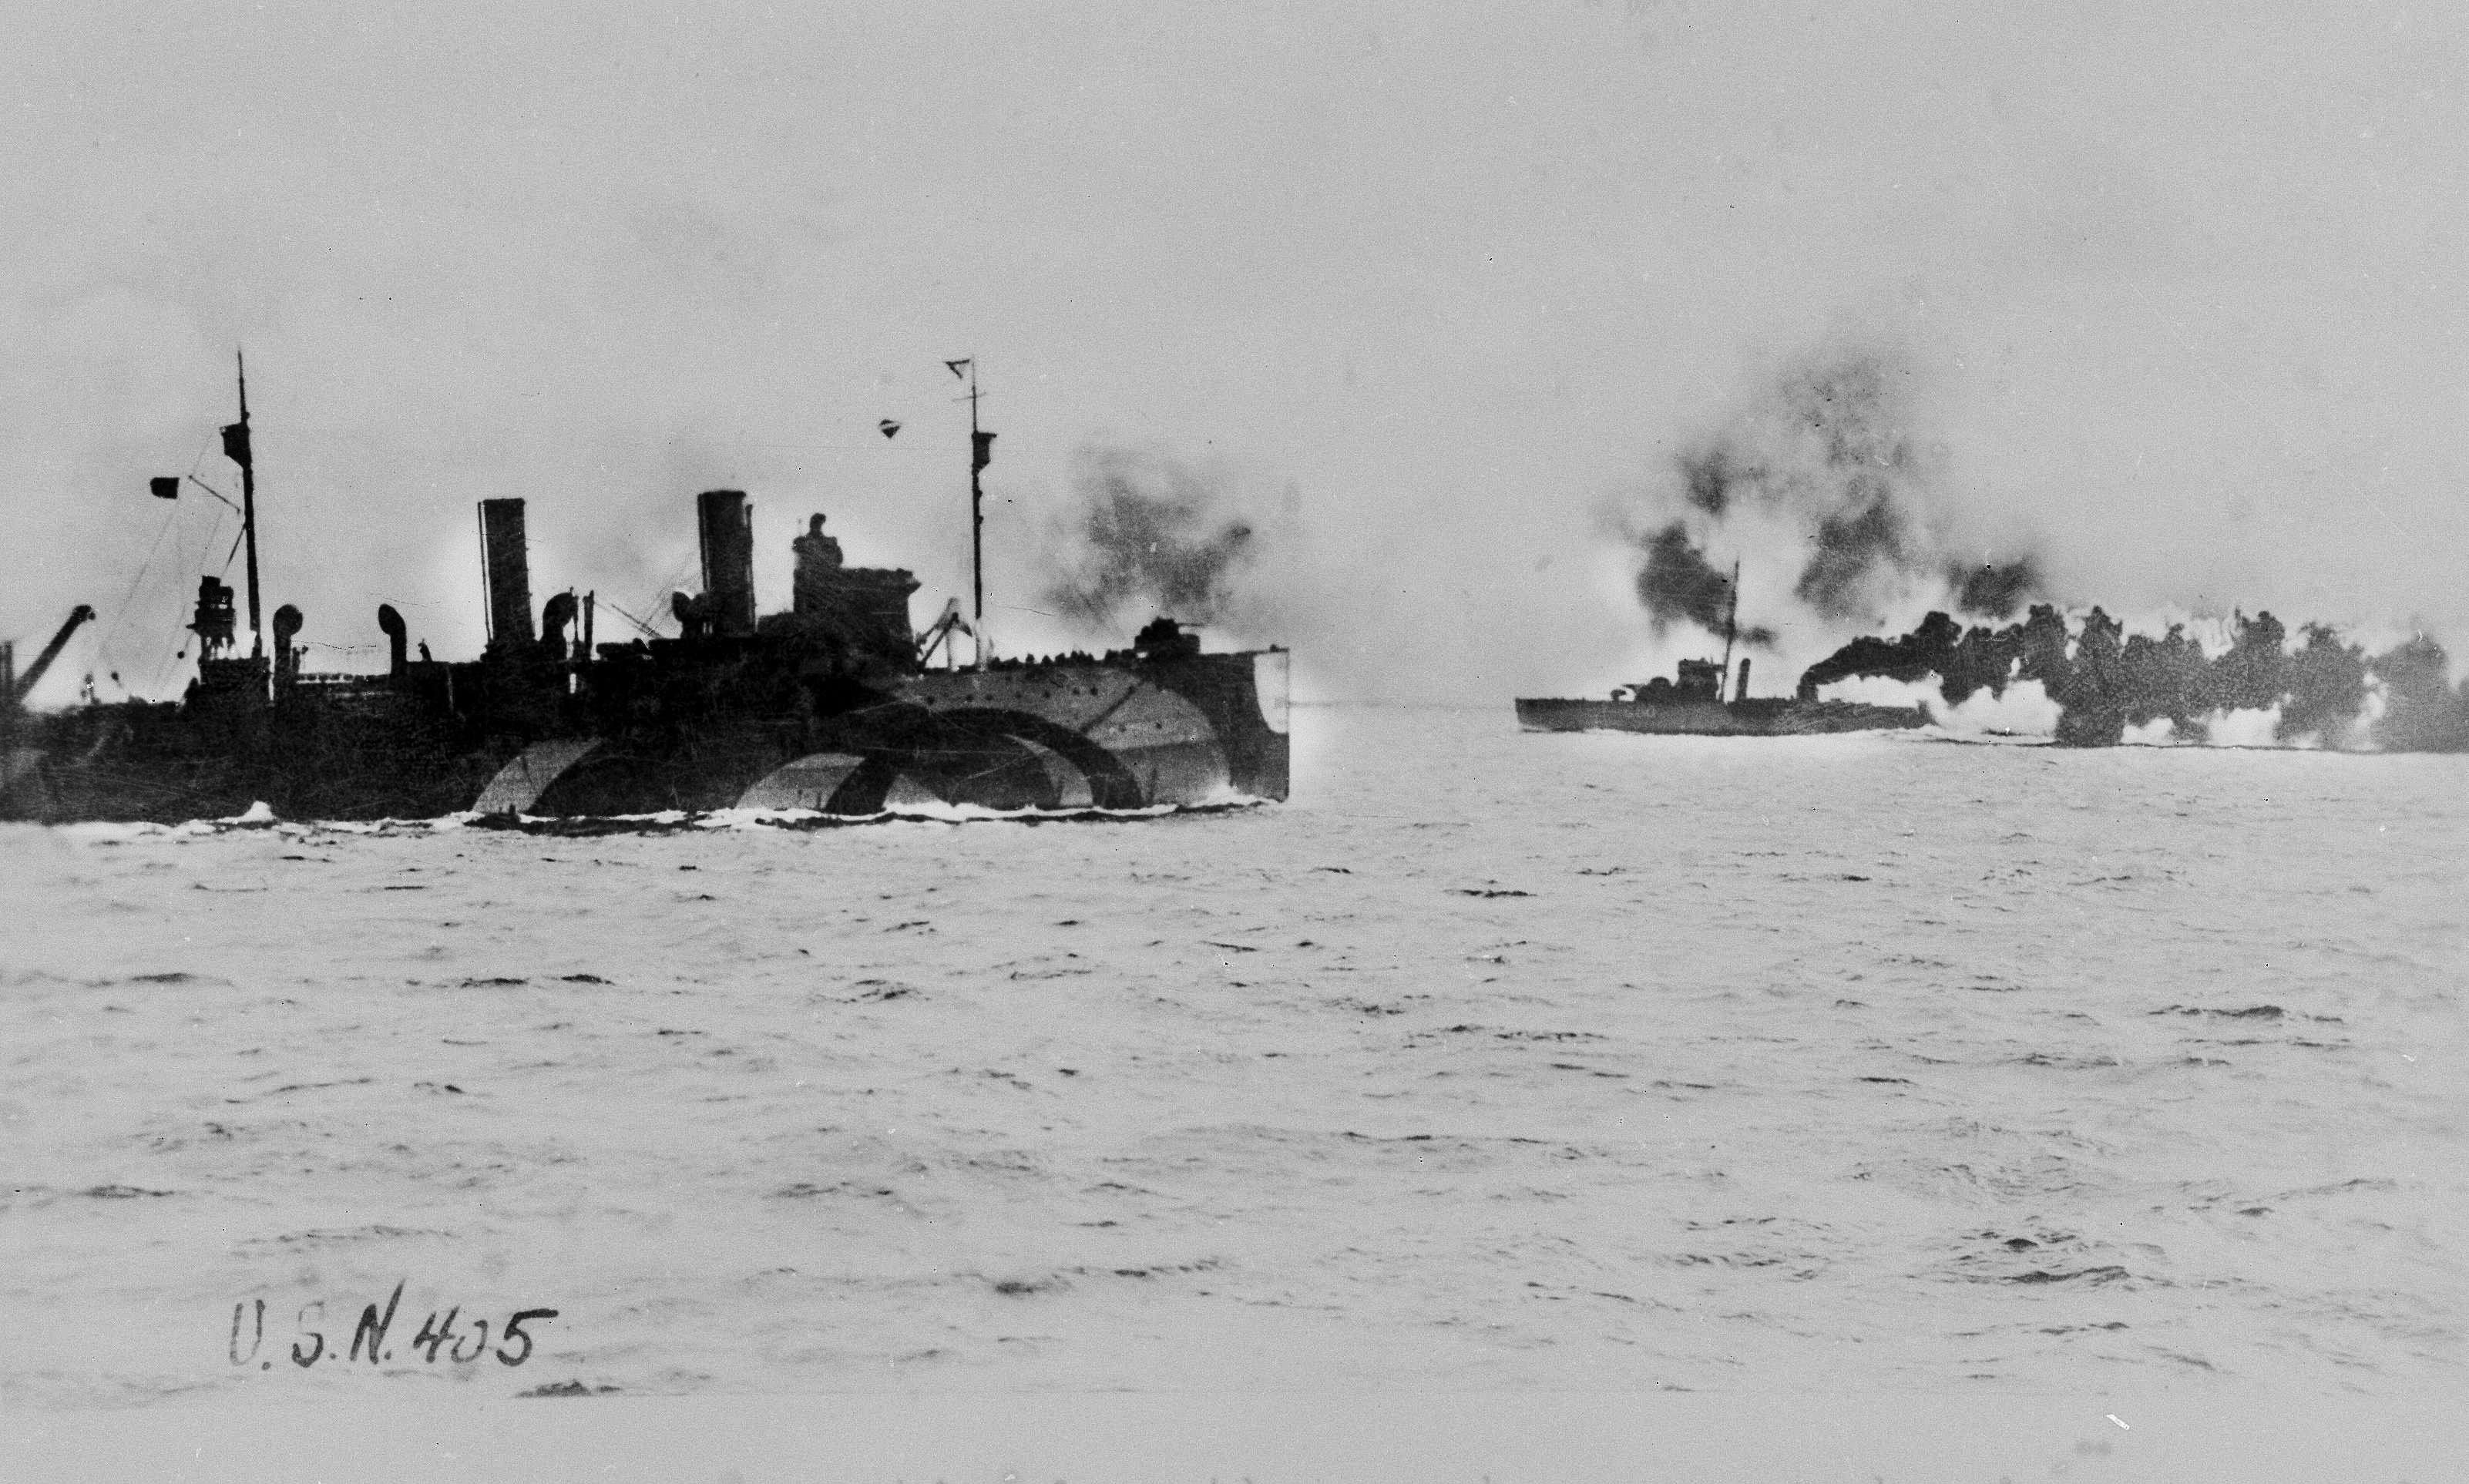 El Vampire, a la derecha, arroja una cortina de humo sobre el Shawmut durante la Primera Guerra Mundial